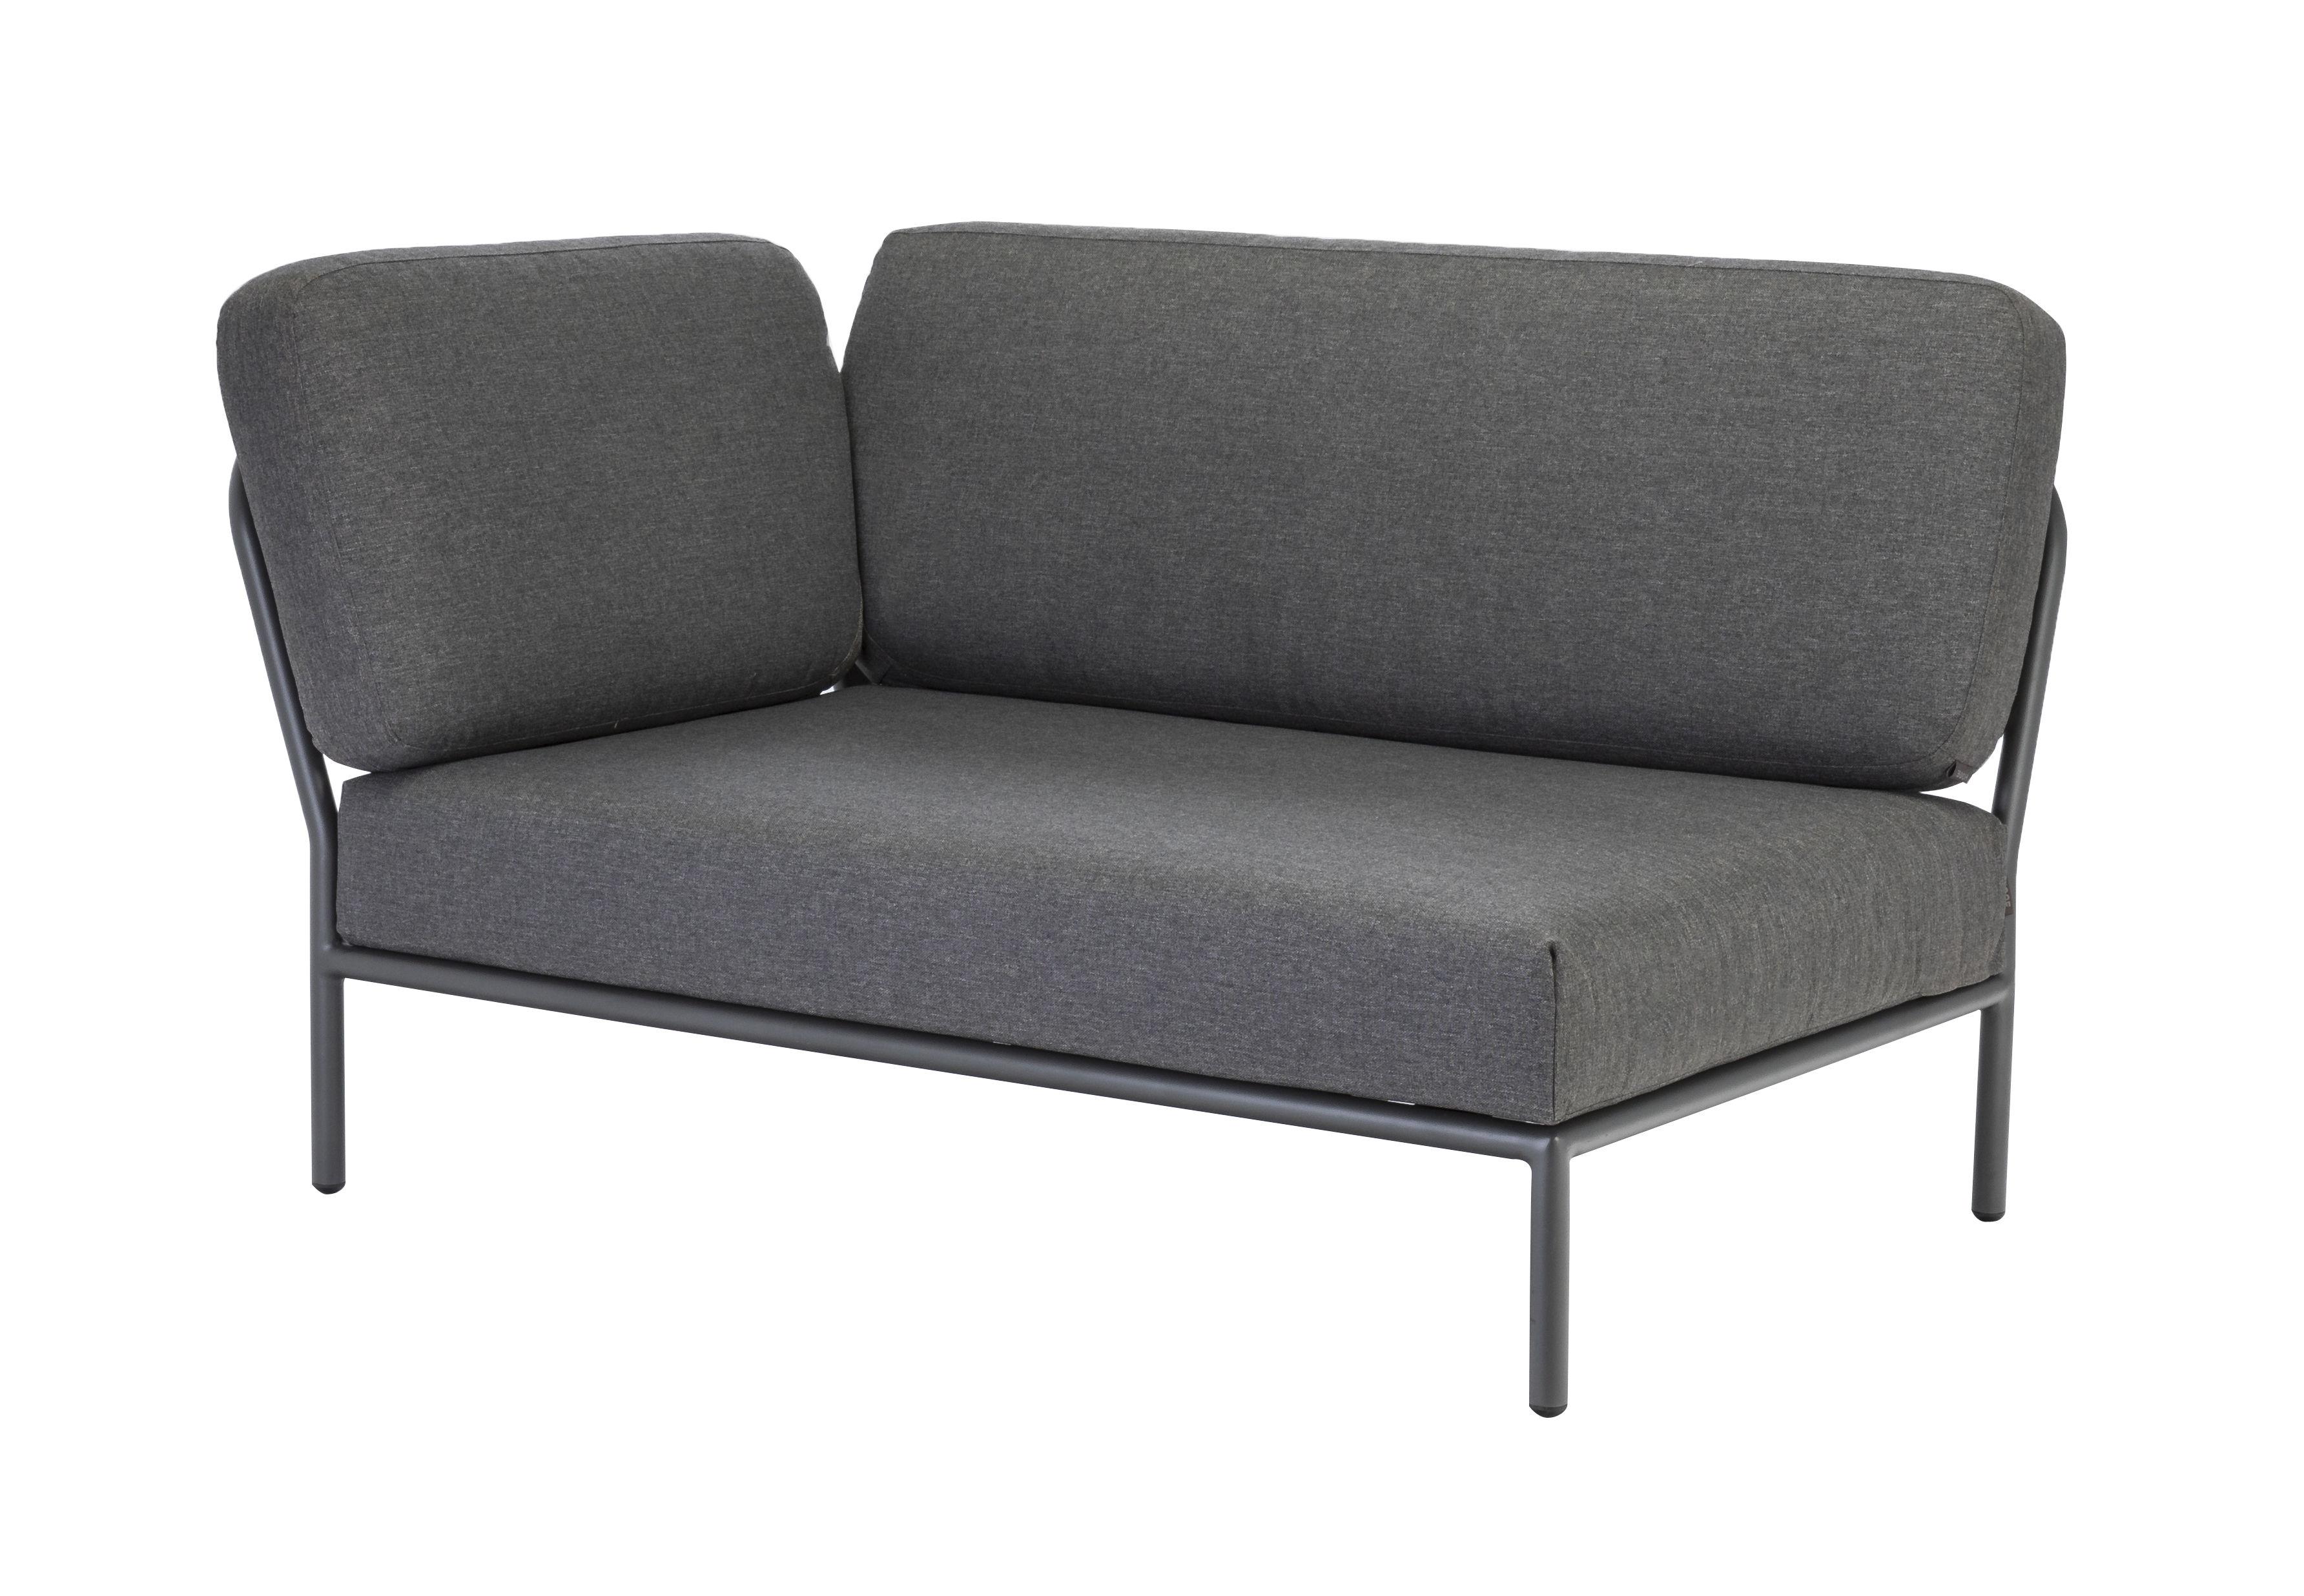 Mobilier - Canapés - Canapé modulable Level / Module angle gauche - L 140 cm / Tissu - Houe - Gris - Aluminium thermo-laqué, Mousse polyuréthane, Tissu polyester